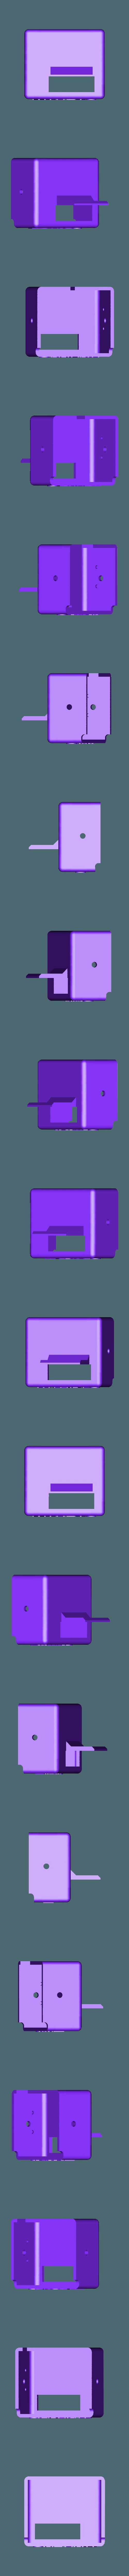 D6_BondTech_Ribbon_Cable_Holder_v1_v10.stl Download free STL file Wanhao D6 / Duplicator 6 / Monoprice Ultimate Maker Ribbon Cable Holder for BondTech • 3D print object, nik101968